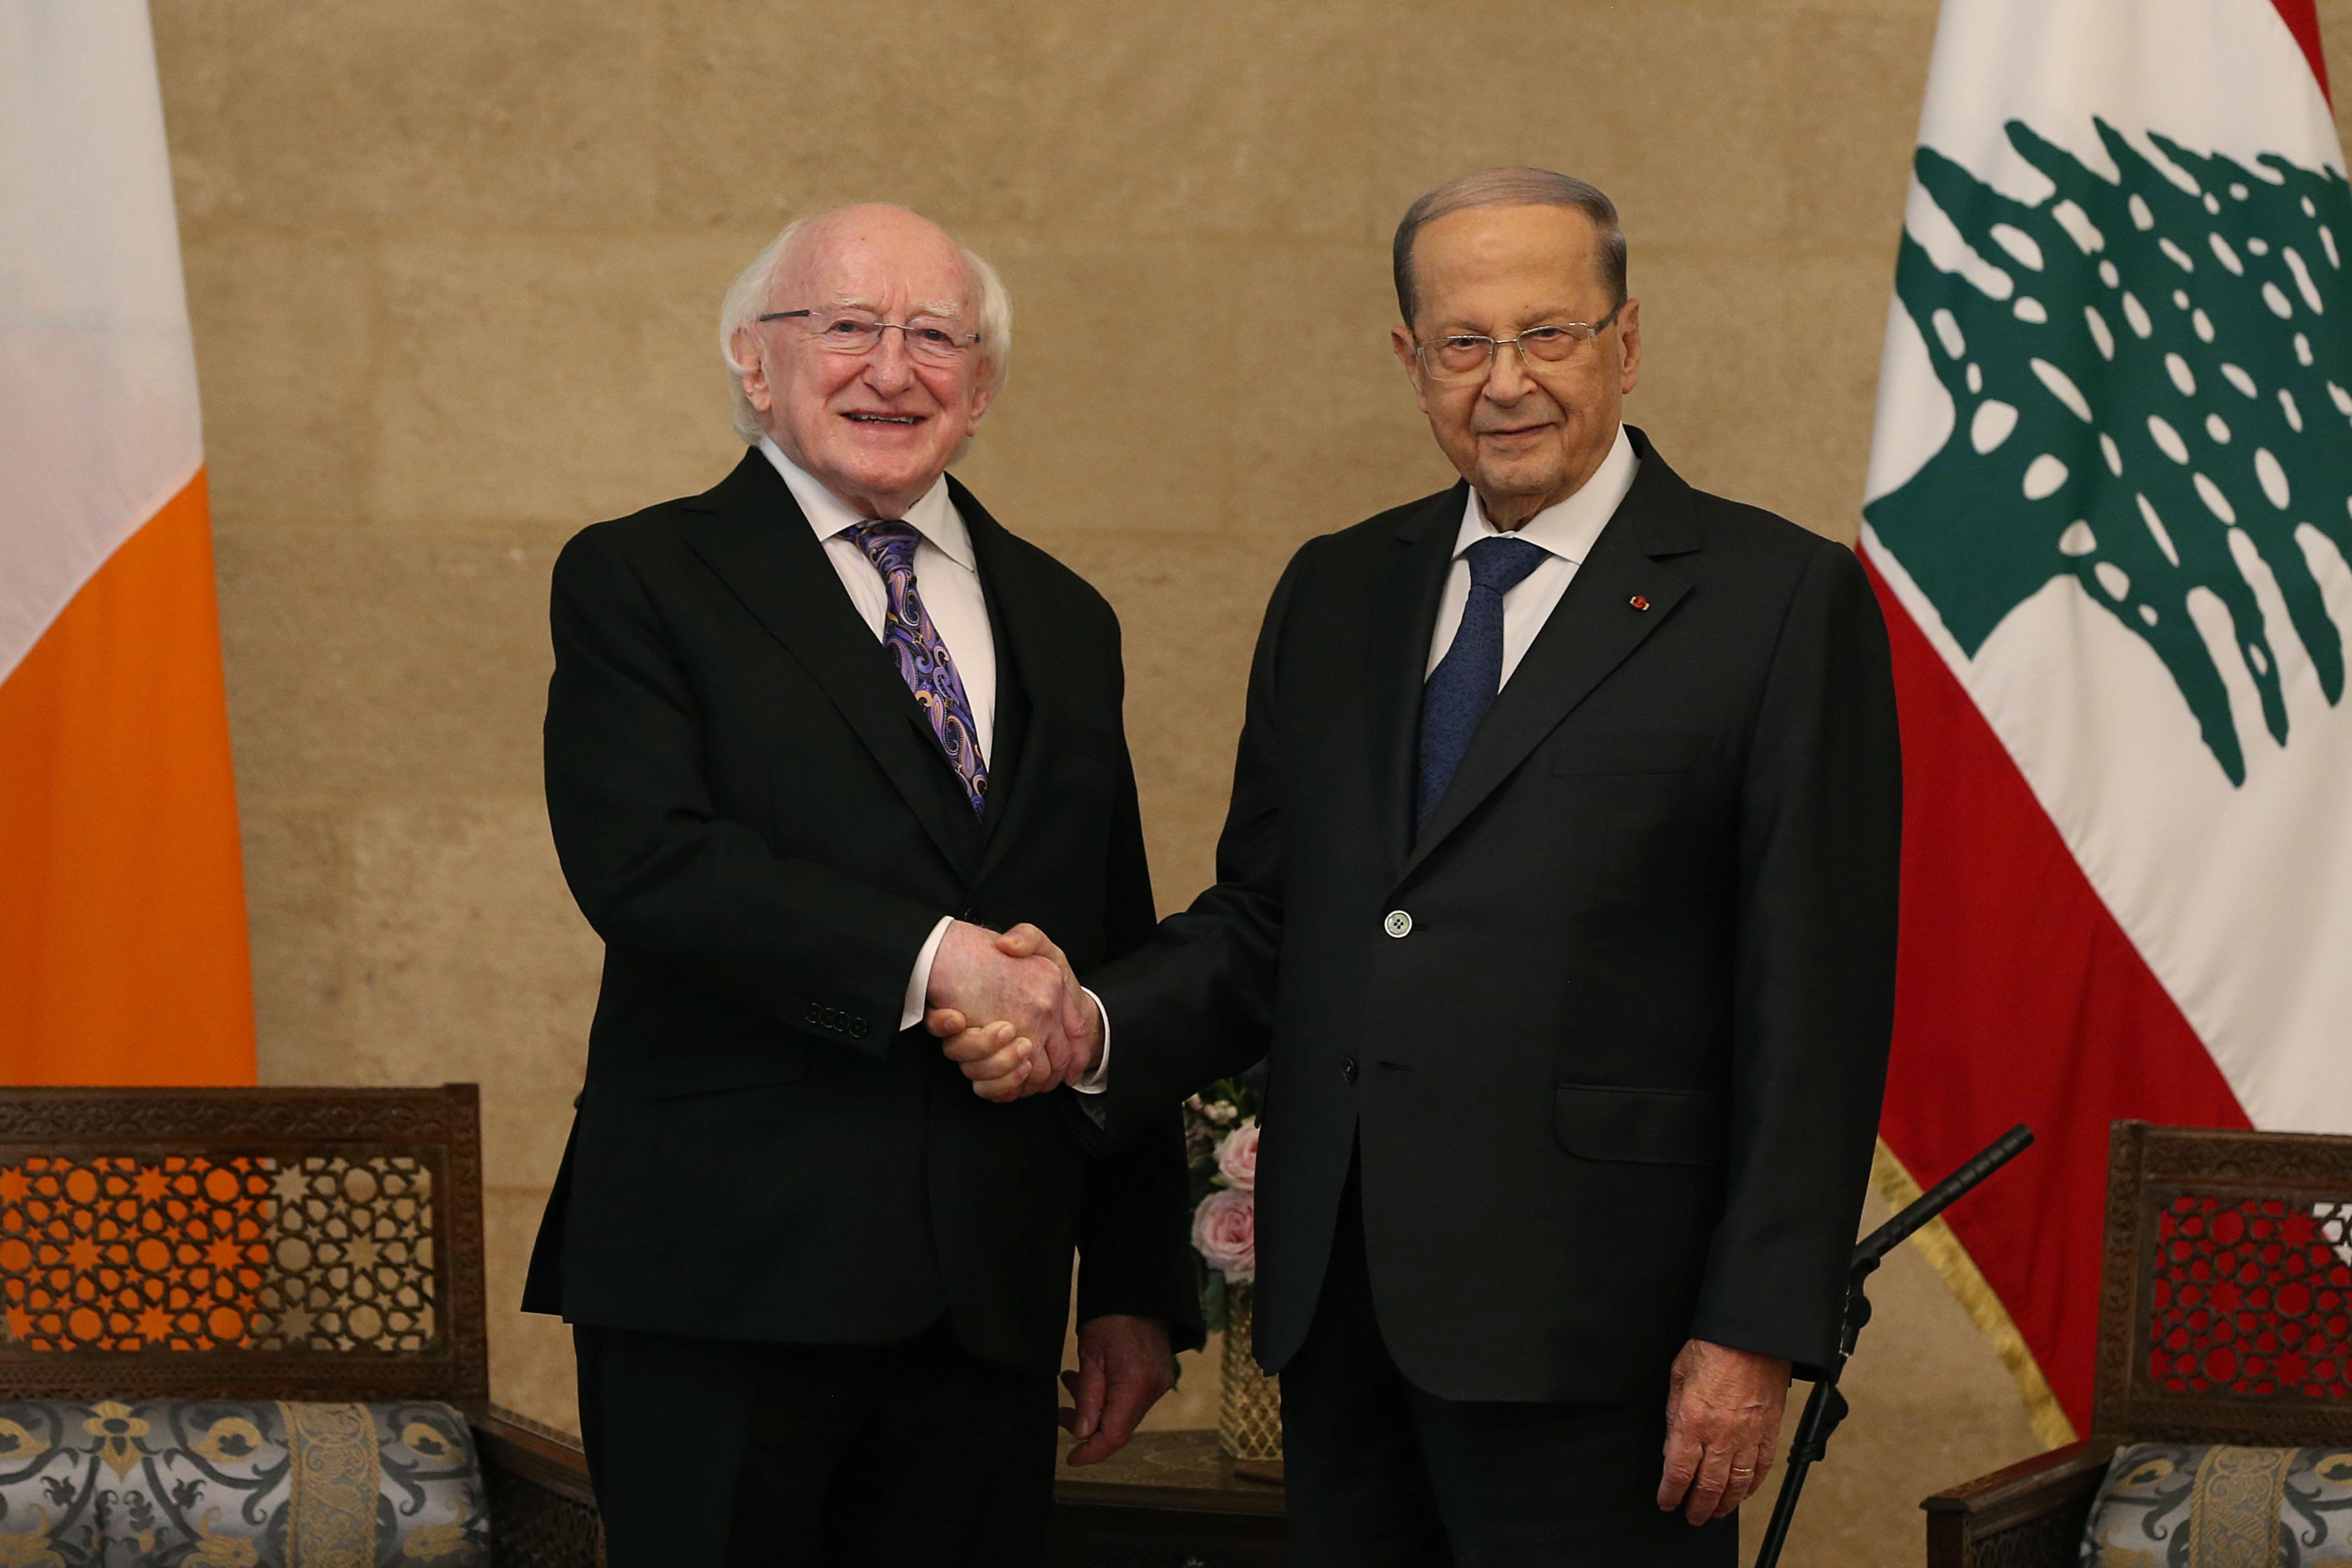 2 - President of Ireland Mr.Michael D. Higgins (2)